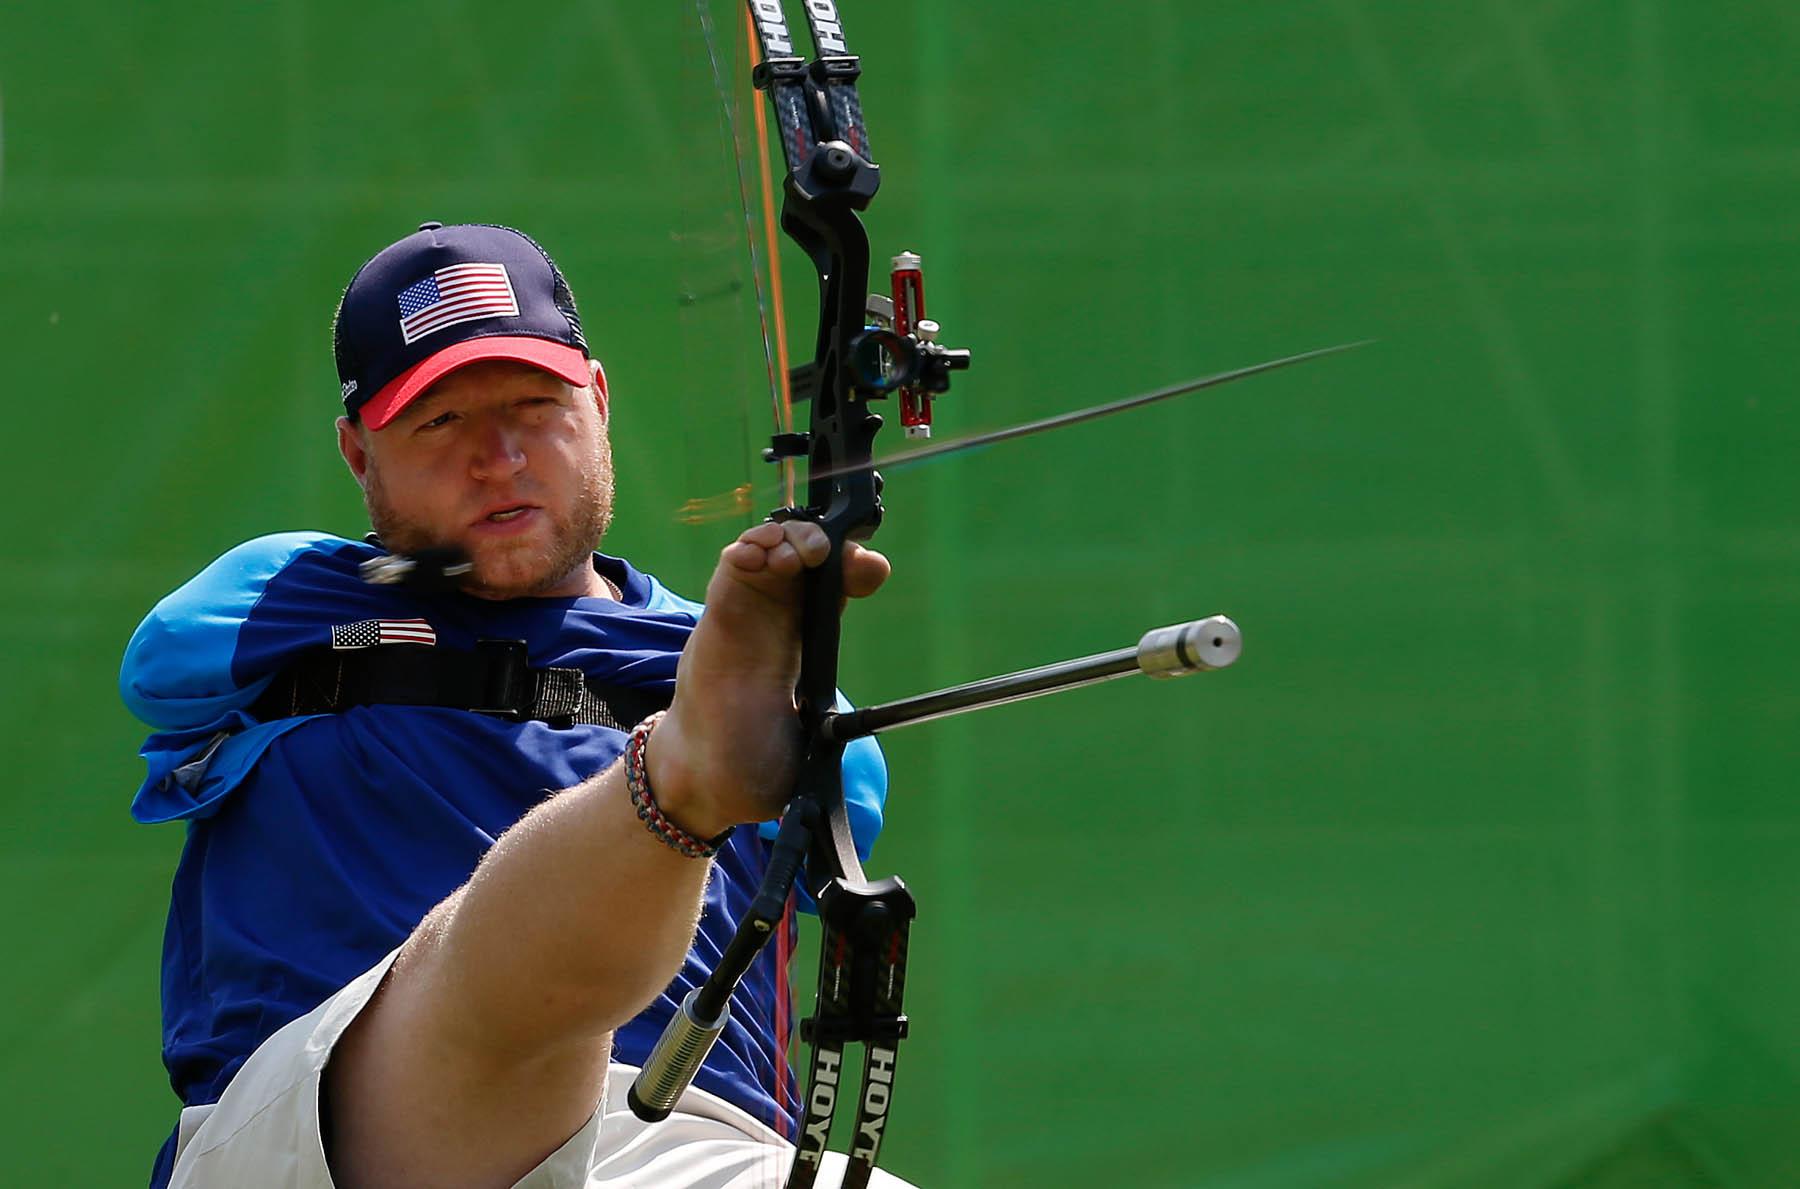 Archer shooting arrow using his legs (© AP Images)